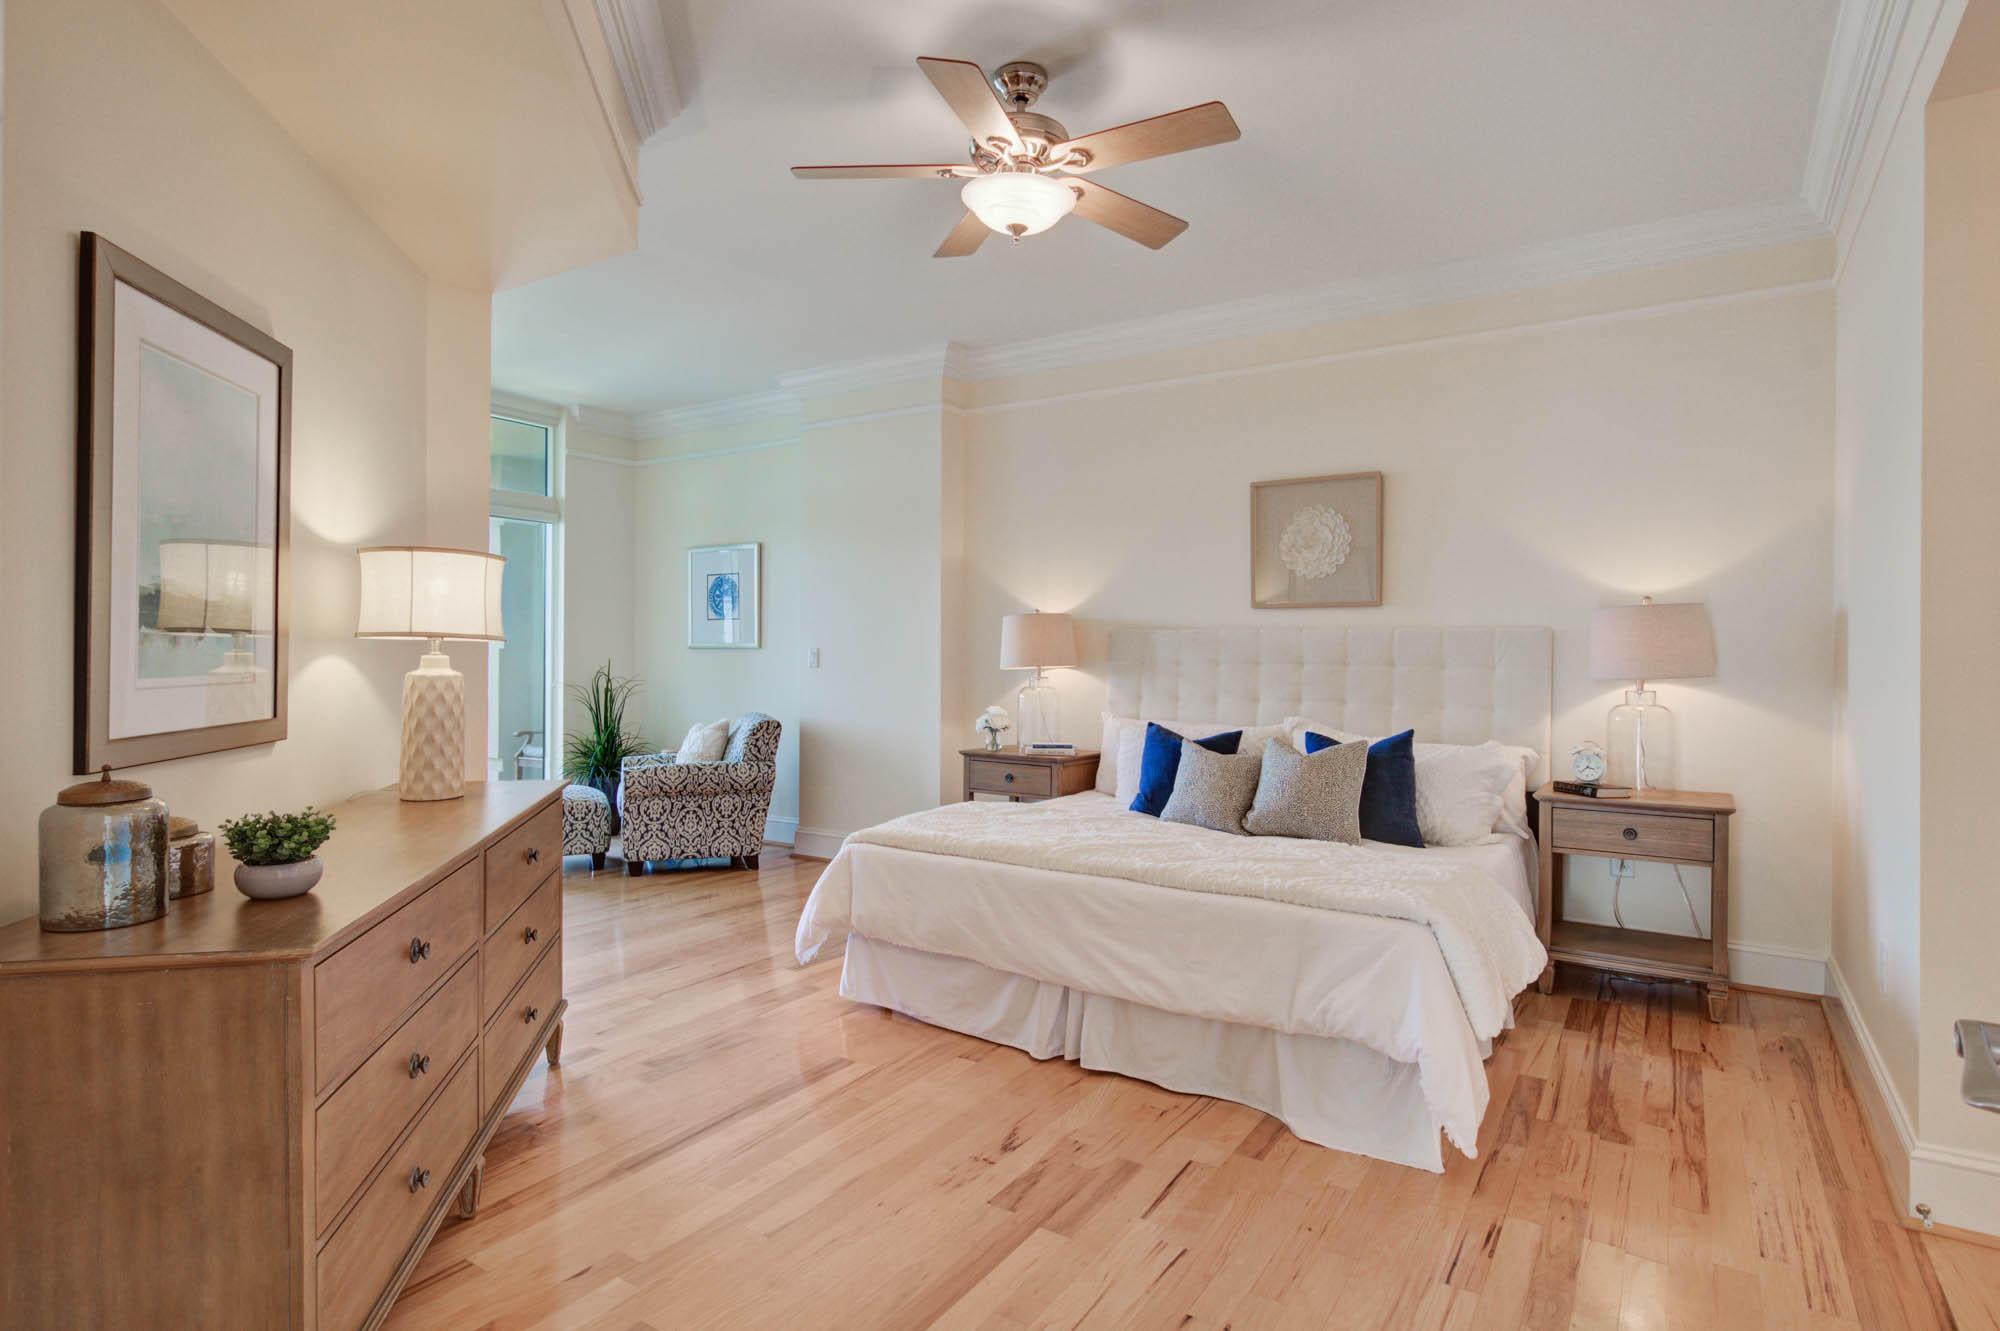 Renaissance On Chas Harbor Homes For Sale - 125 Plaza, Mount Pleasant, SC - 33